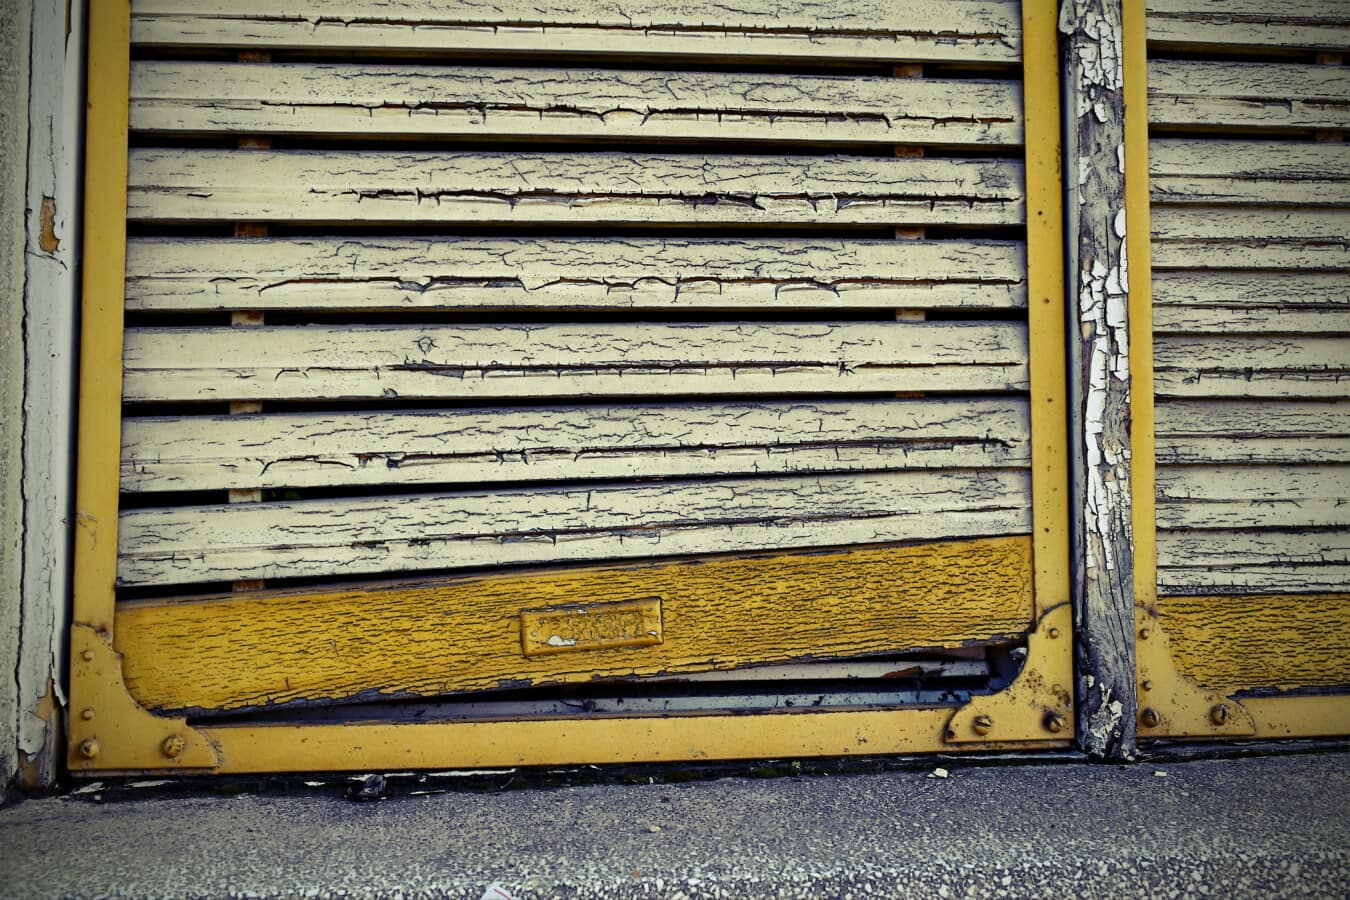 Fenster, Fassade, dreckig, alt, Verfall, gelblich-braun, malen, Grunge, Holz, aus Holz